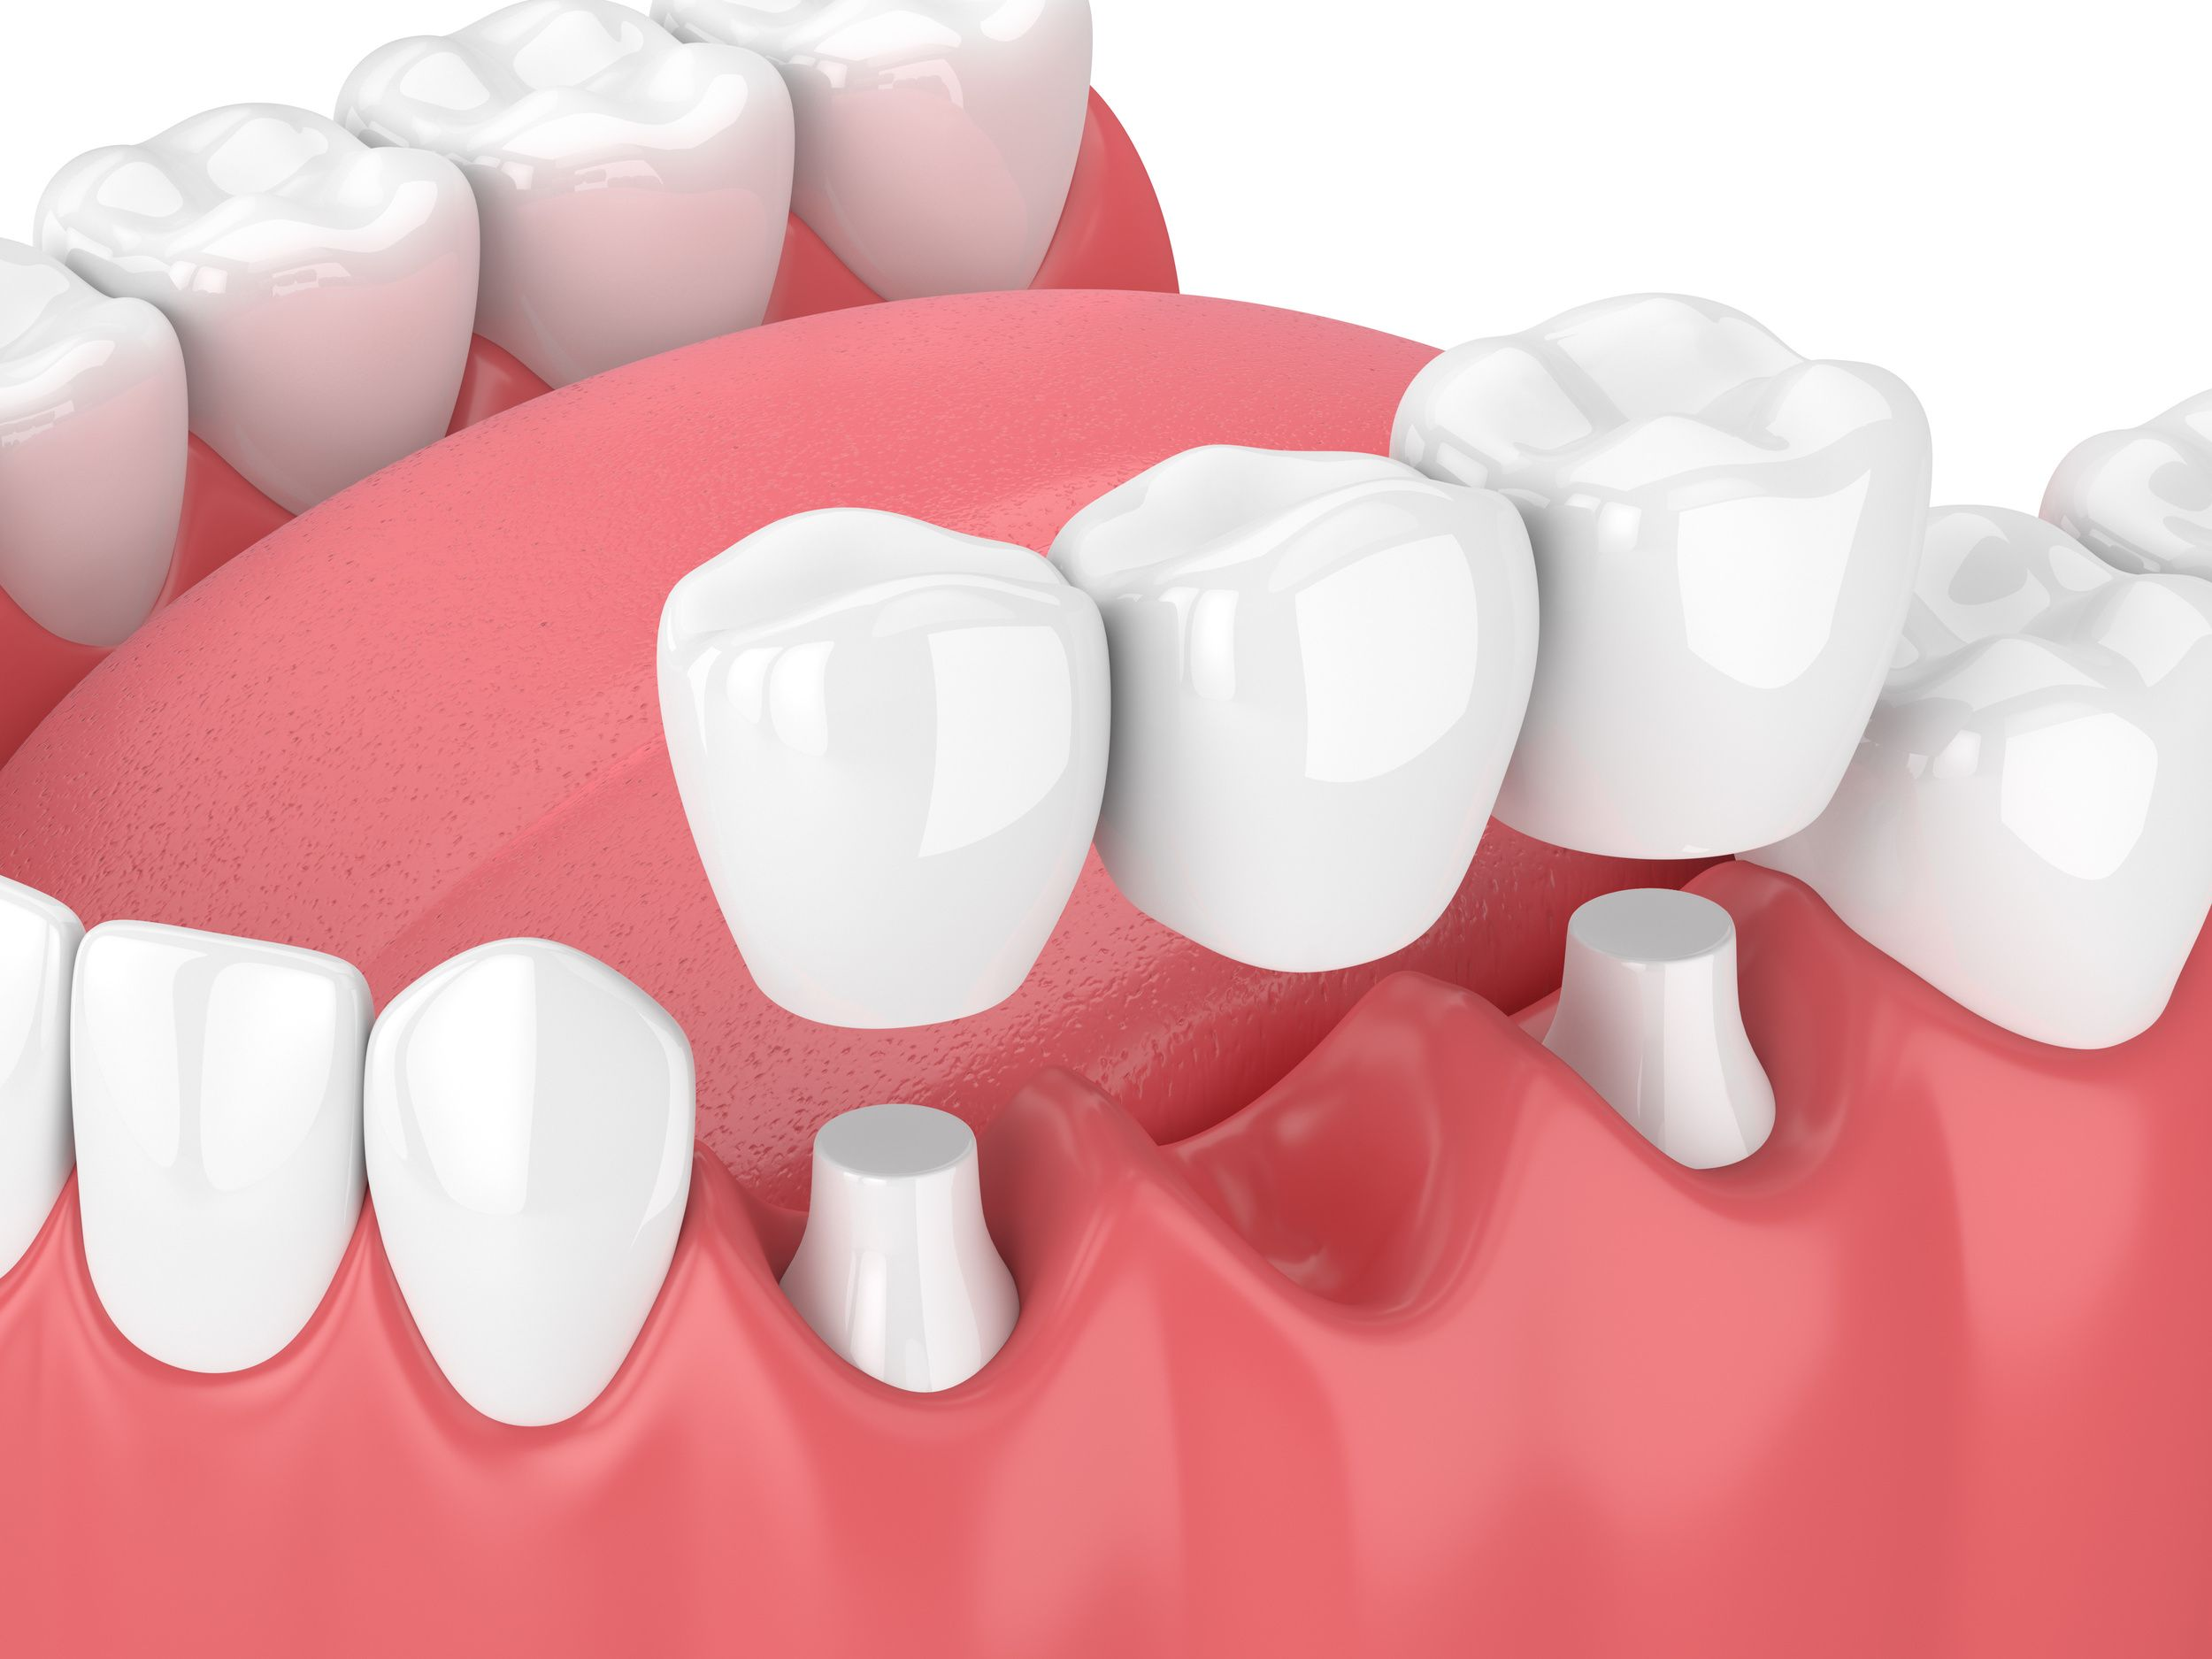 Dental bridge & it's benefits A dental bridge is a dental